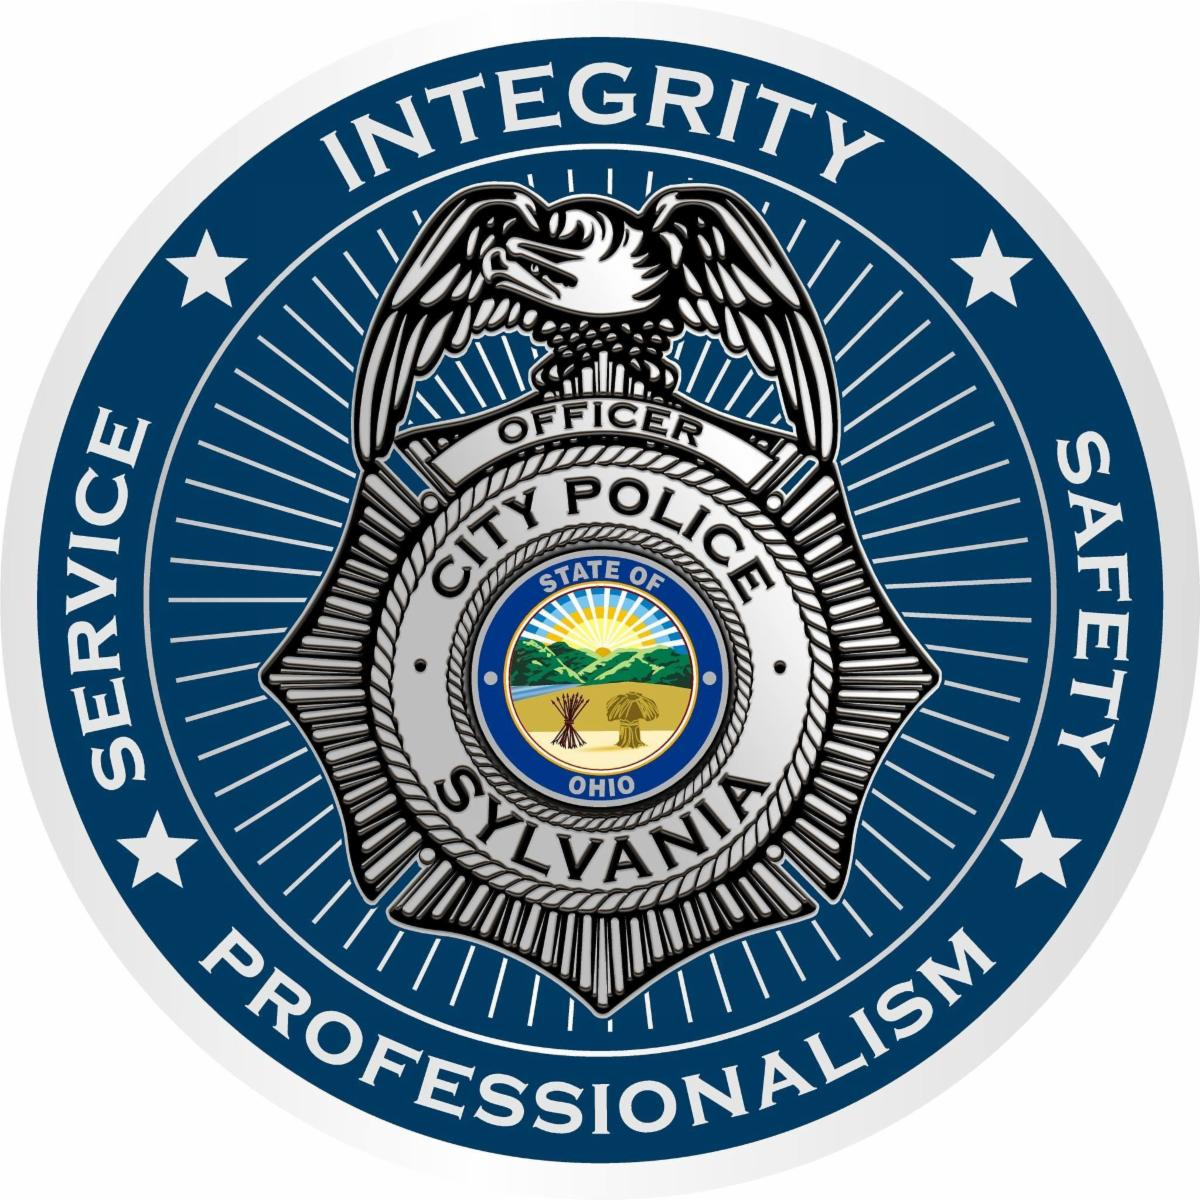 City of Sylvania Police Division